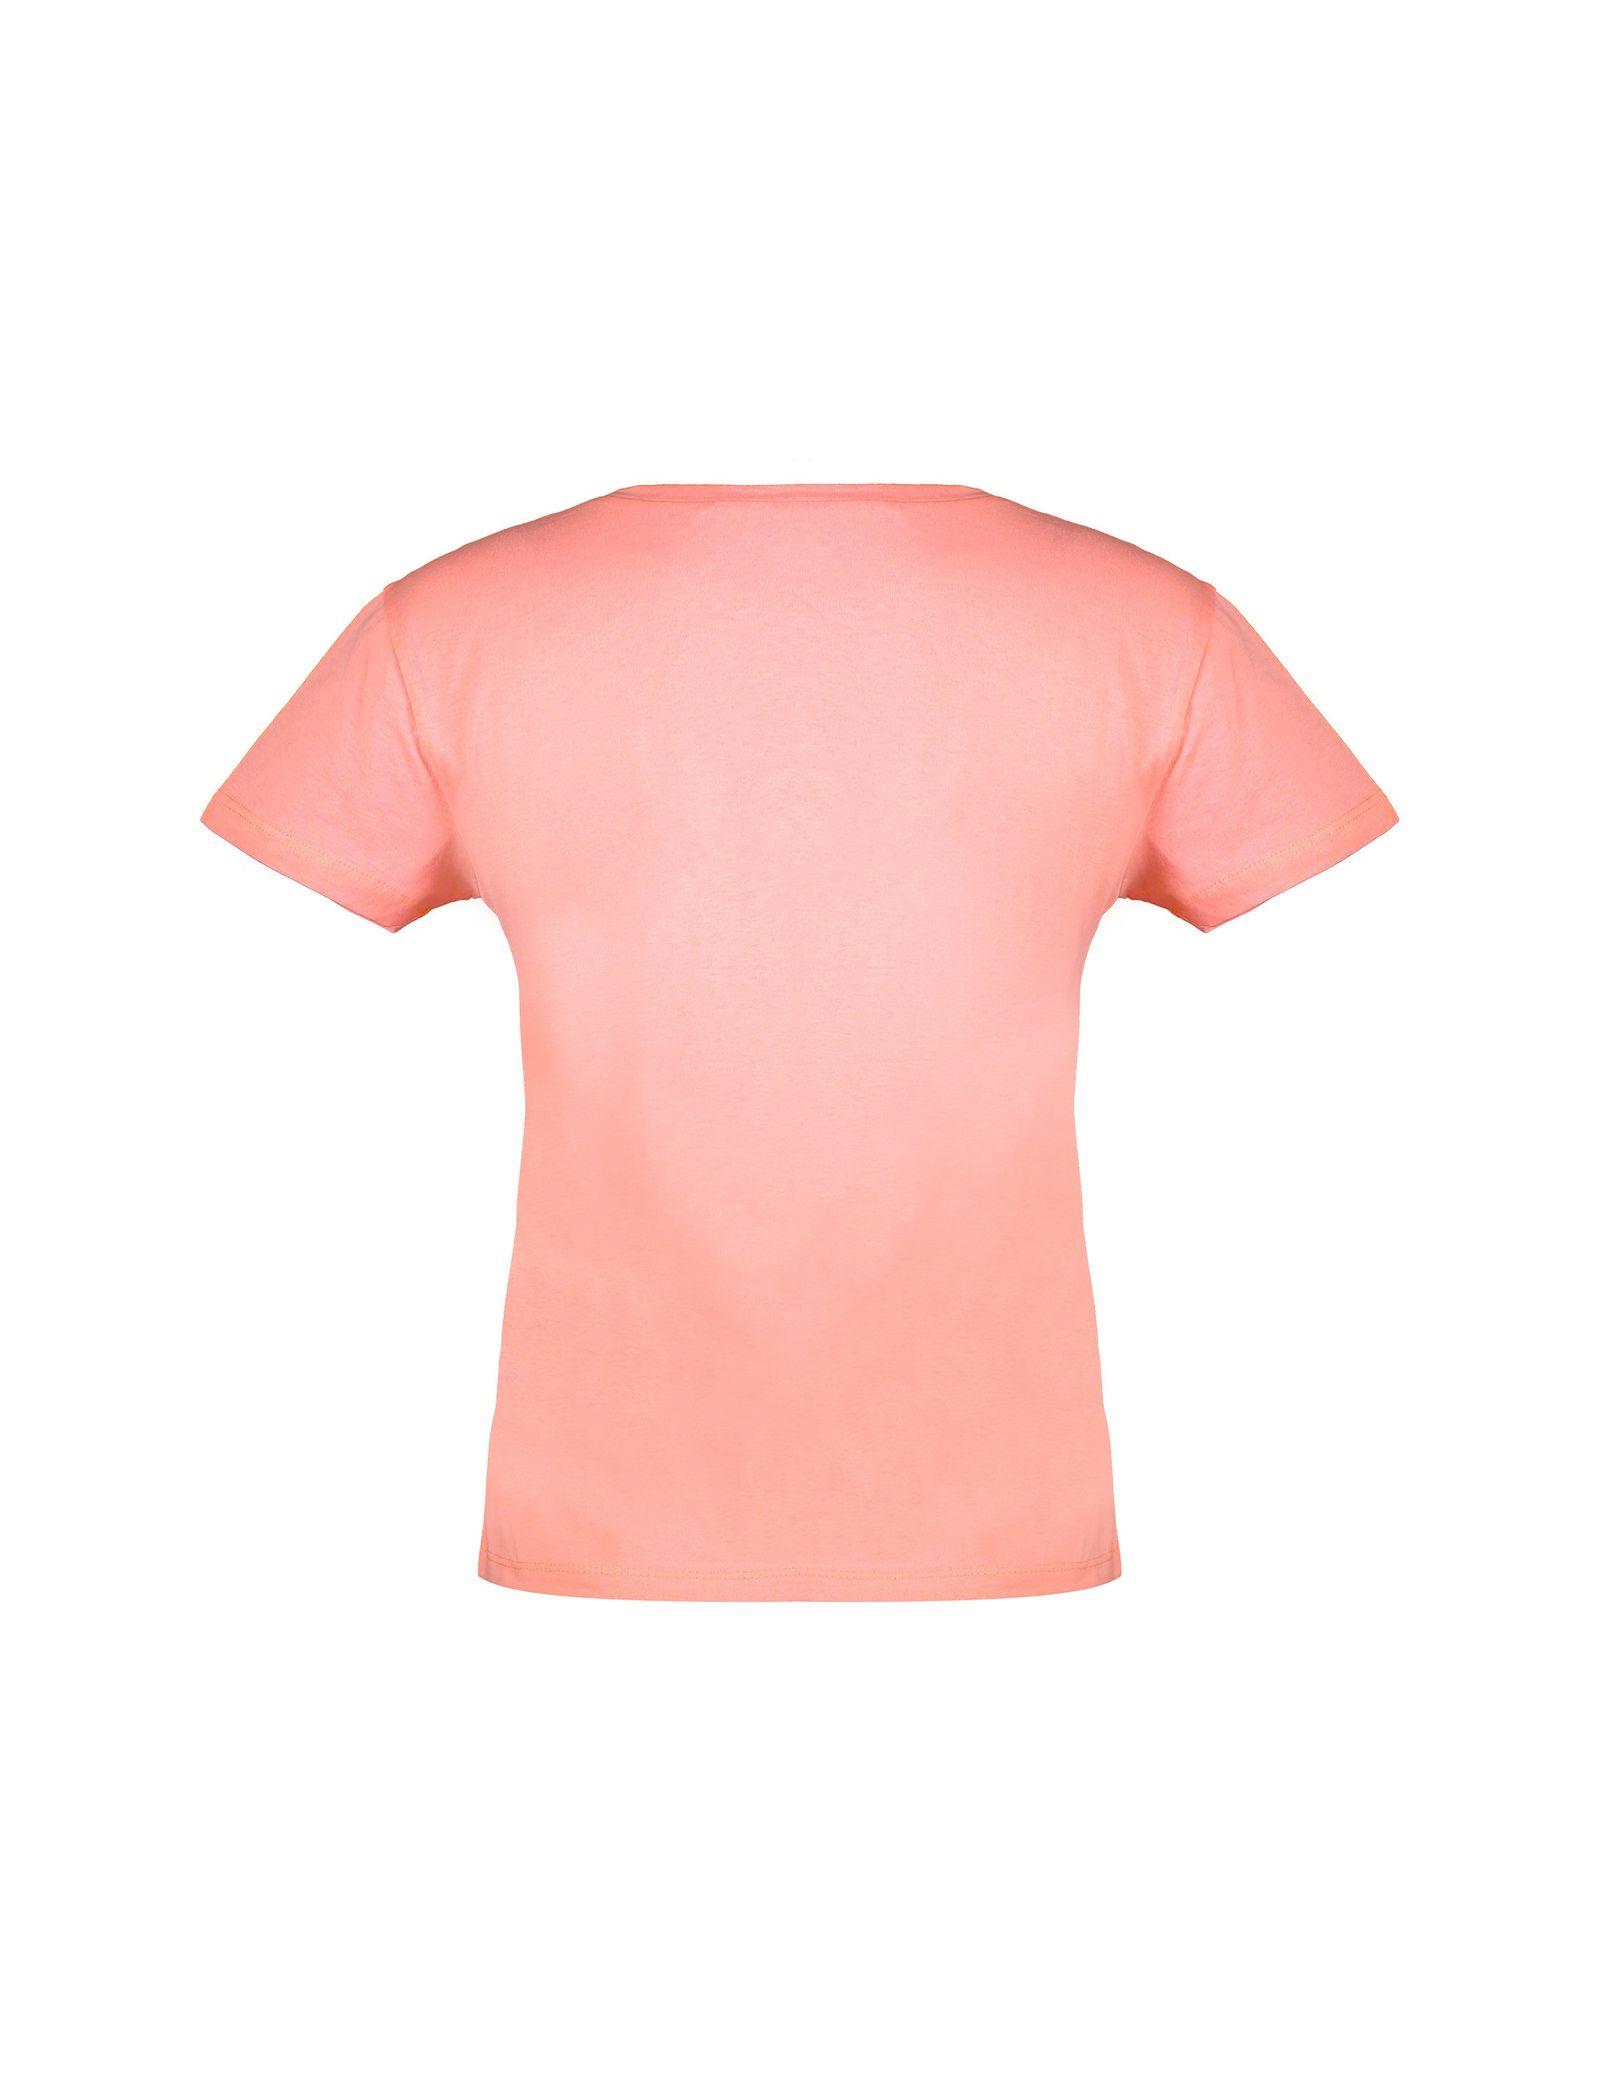 تی شرت نخی یقه گرد زنانه - کوتون - صورتي روشن - 2